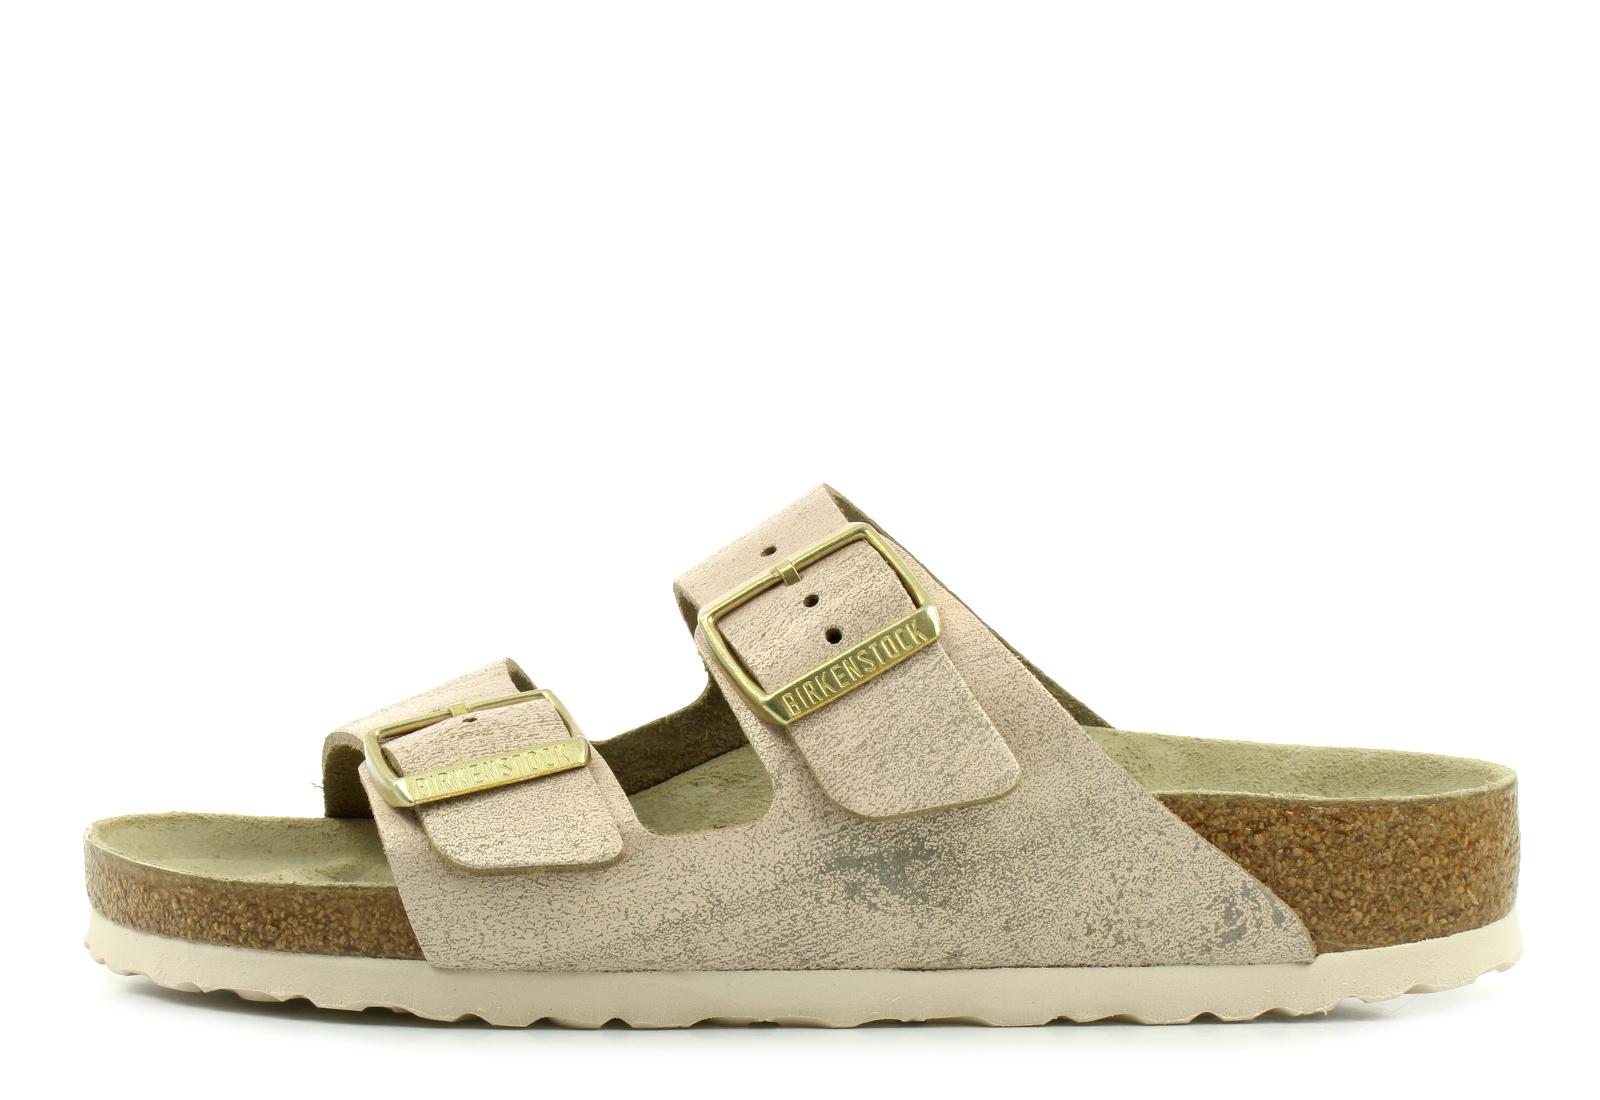 Birkenstock Slippers Arizona 1008800 Rsg Online Shop